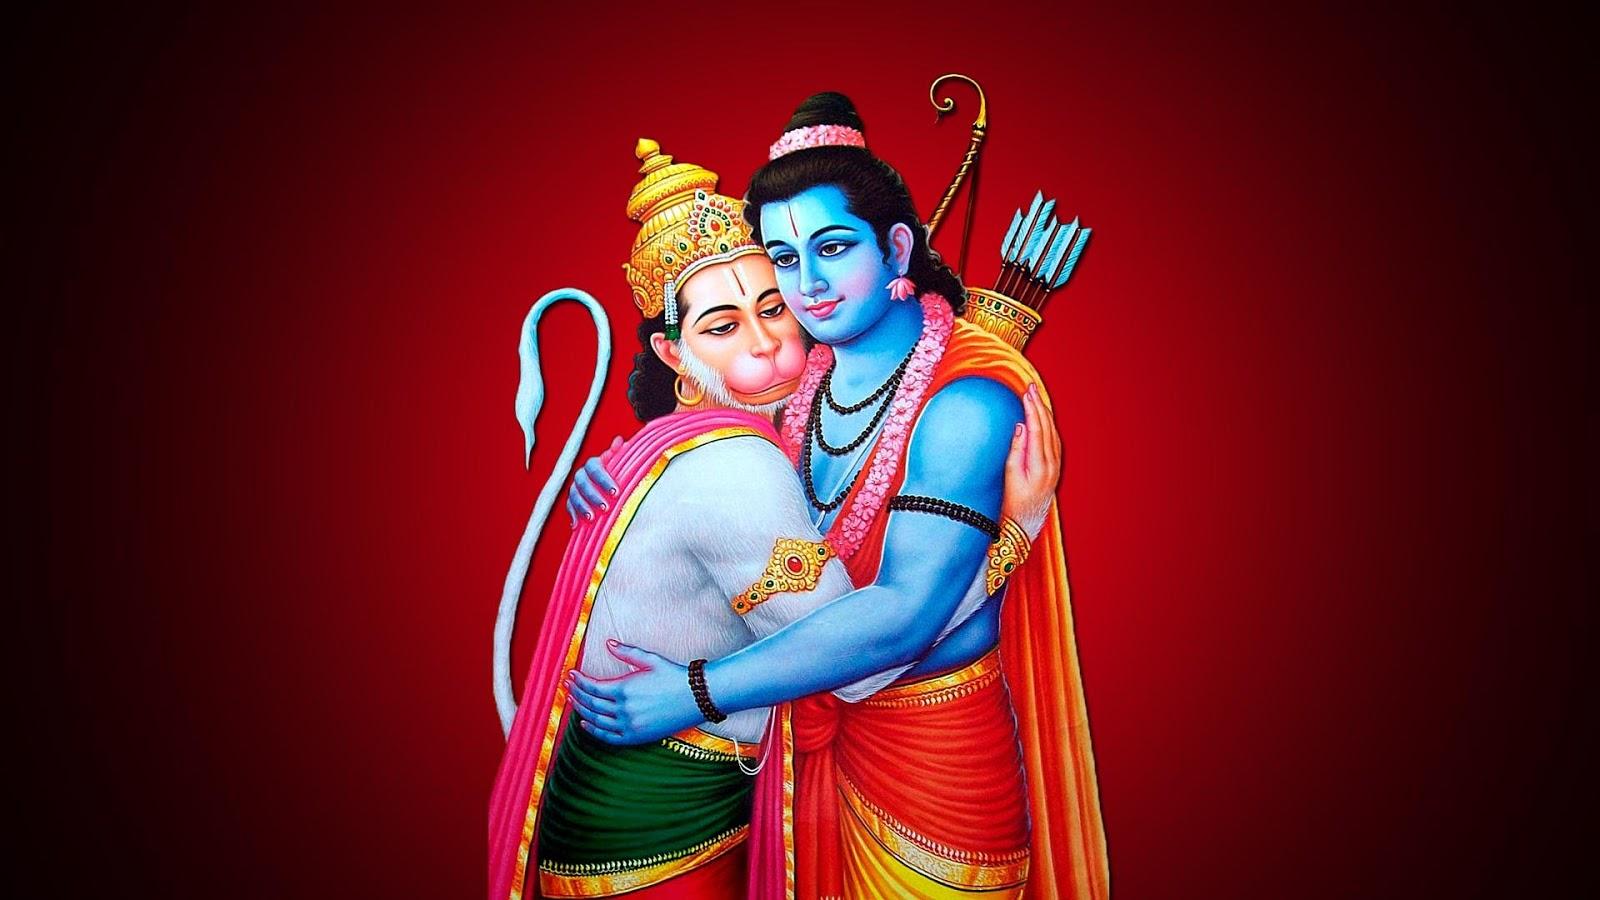 Hanuman Hd Wallpaper Full Size Lord Ram And Hanuman Hug